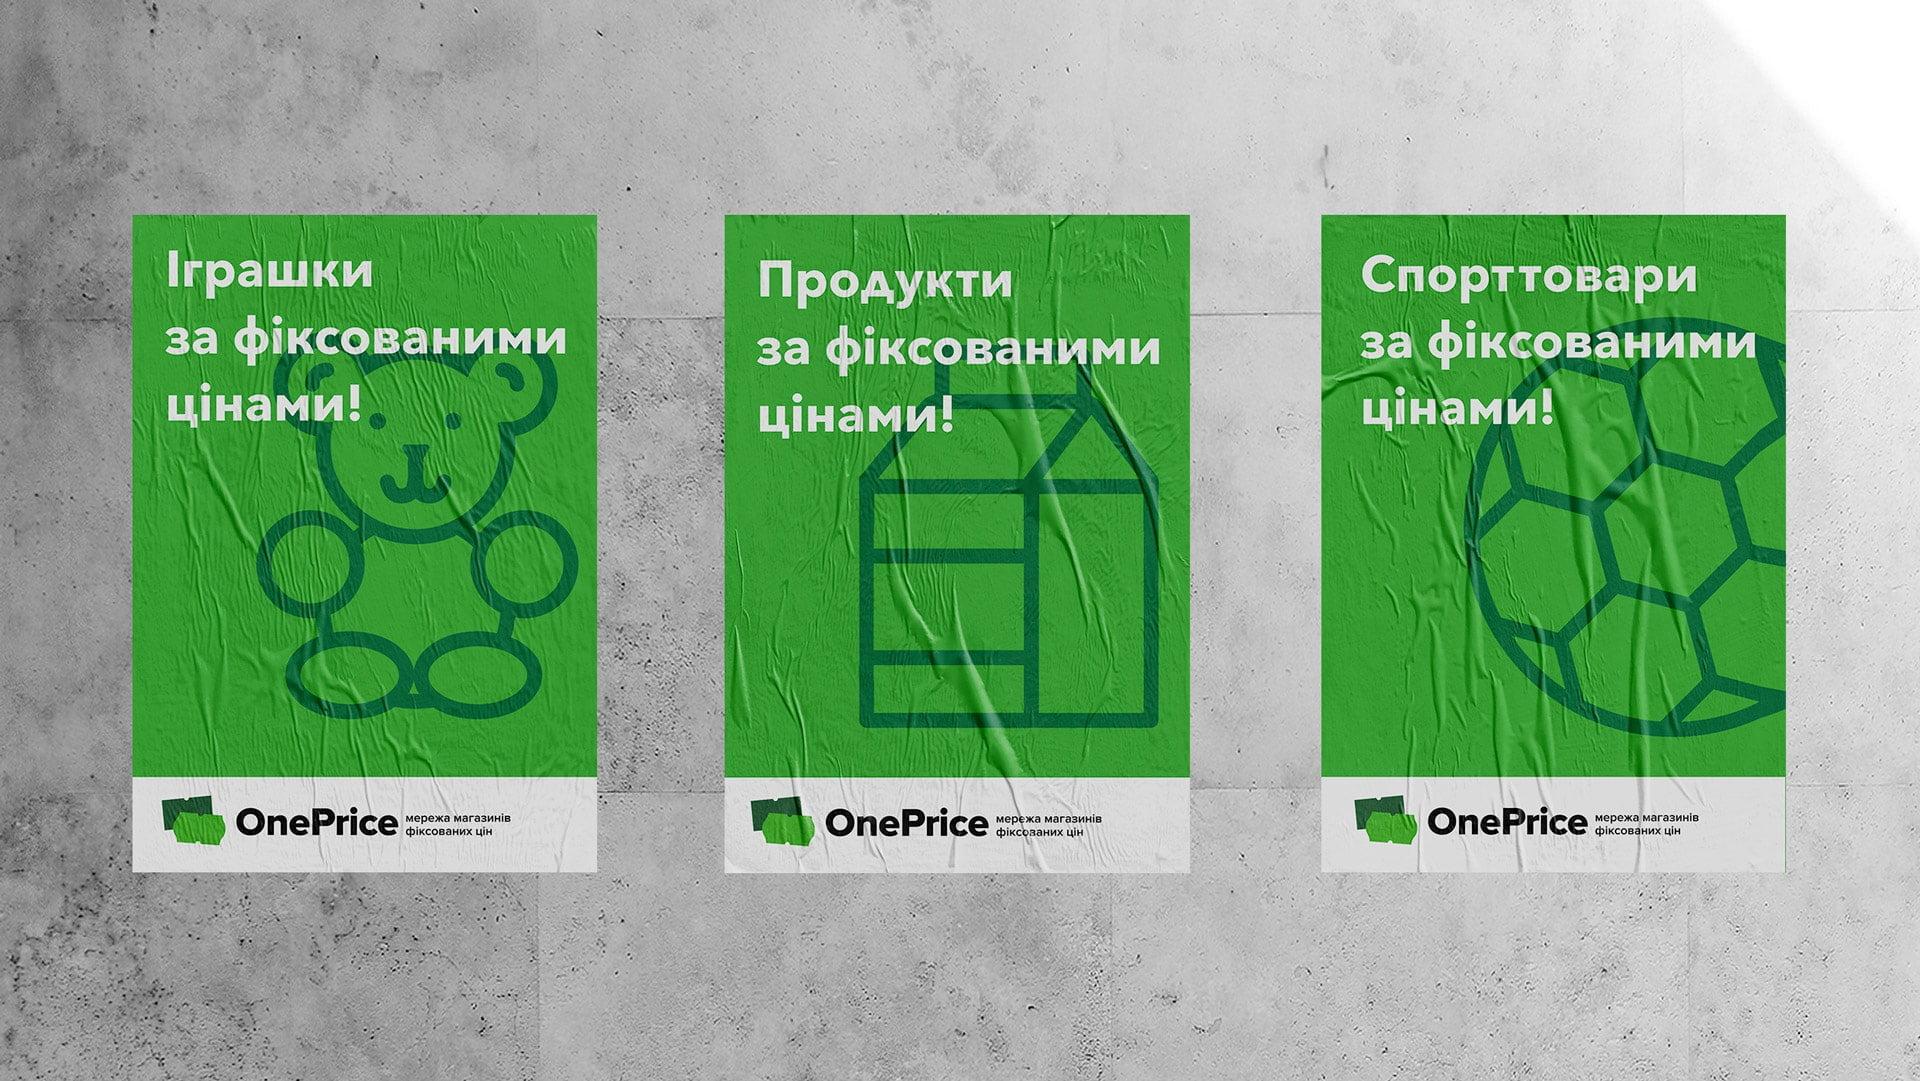 gra brand design oneprice 3